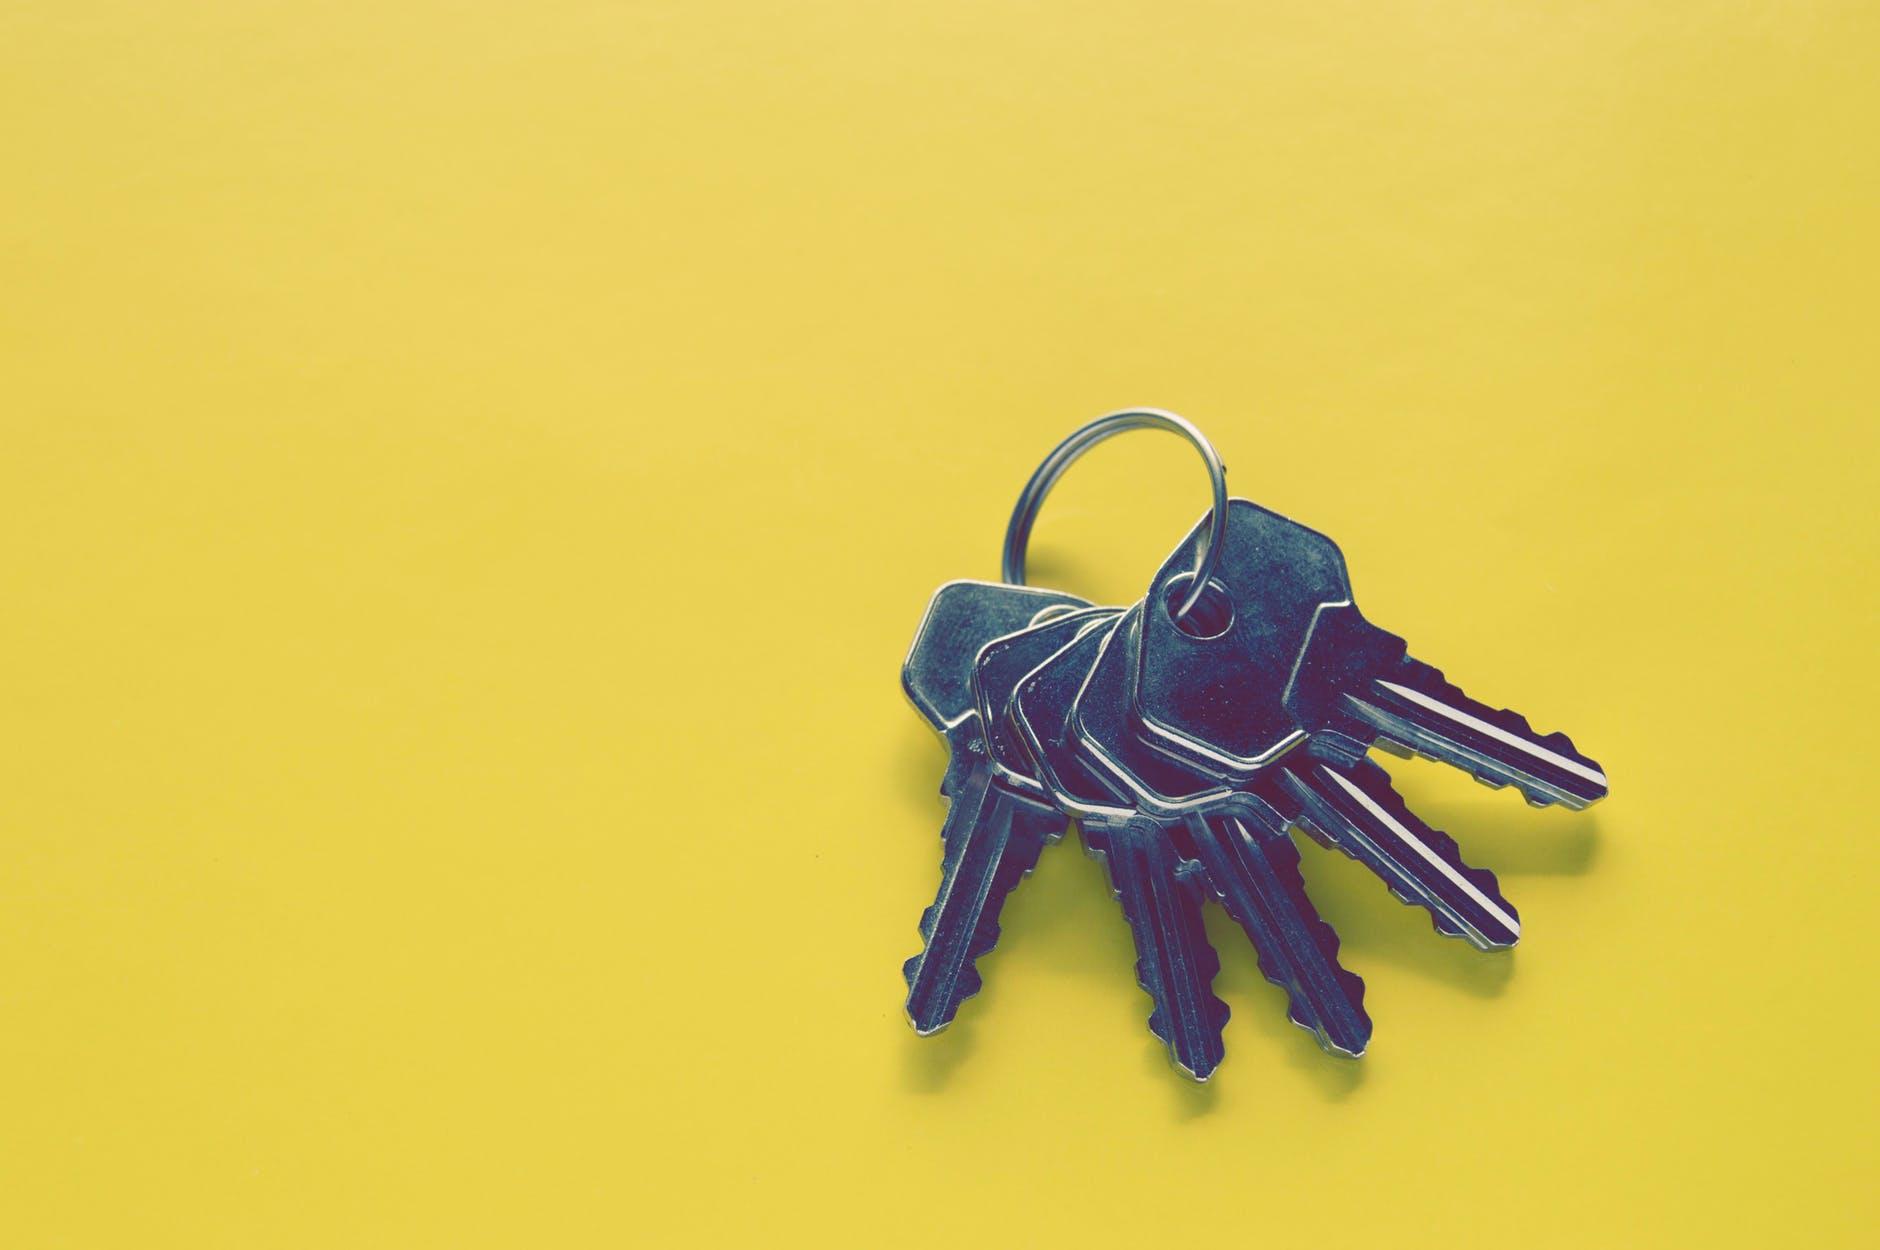 A keychain